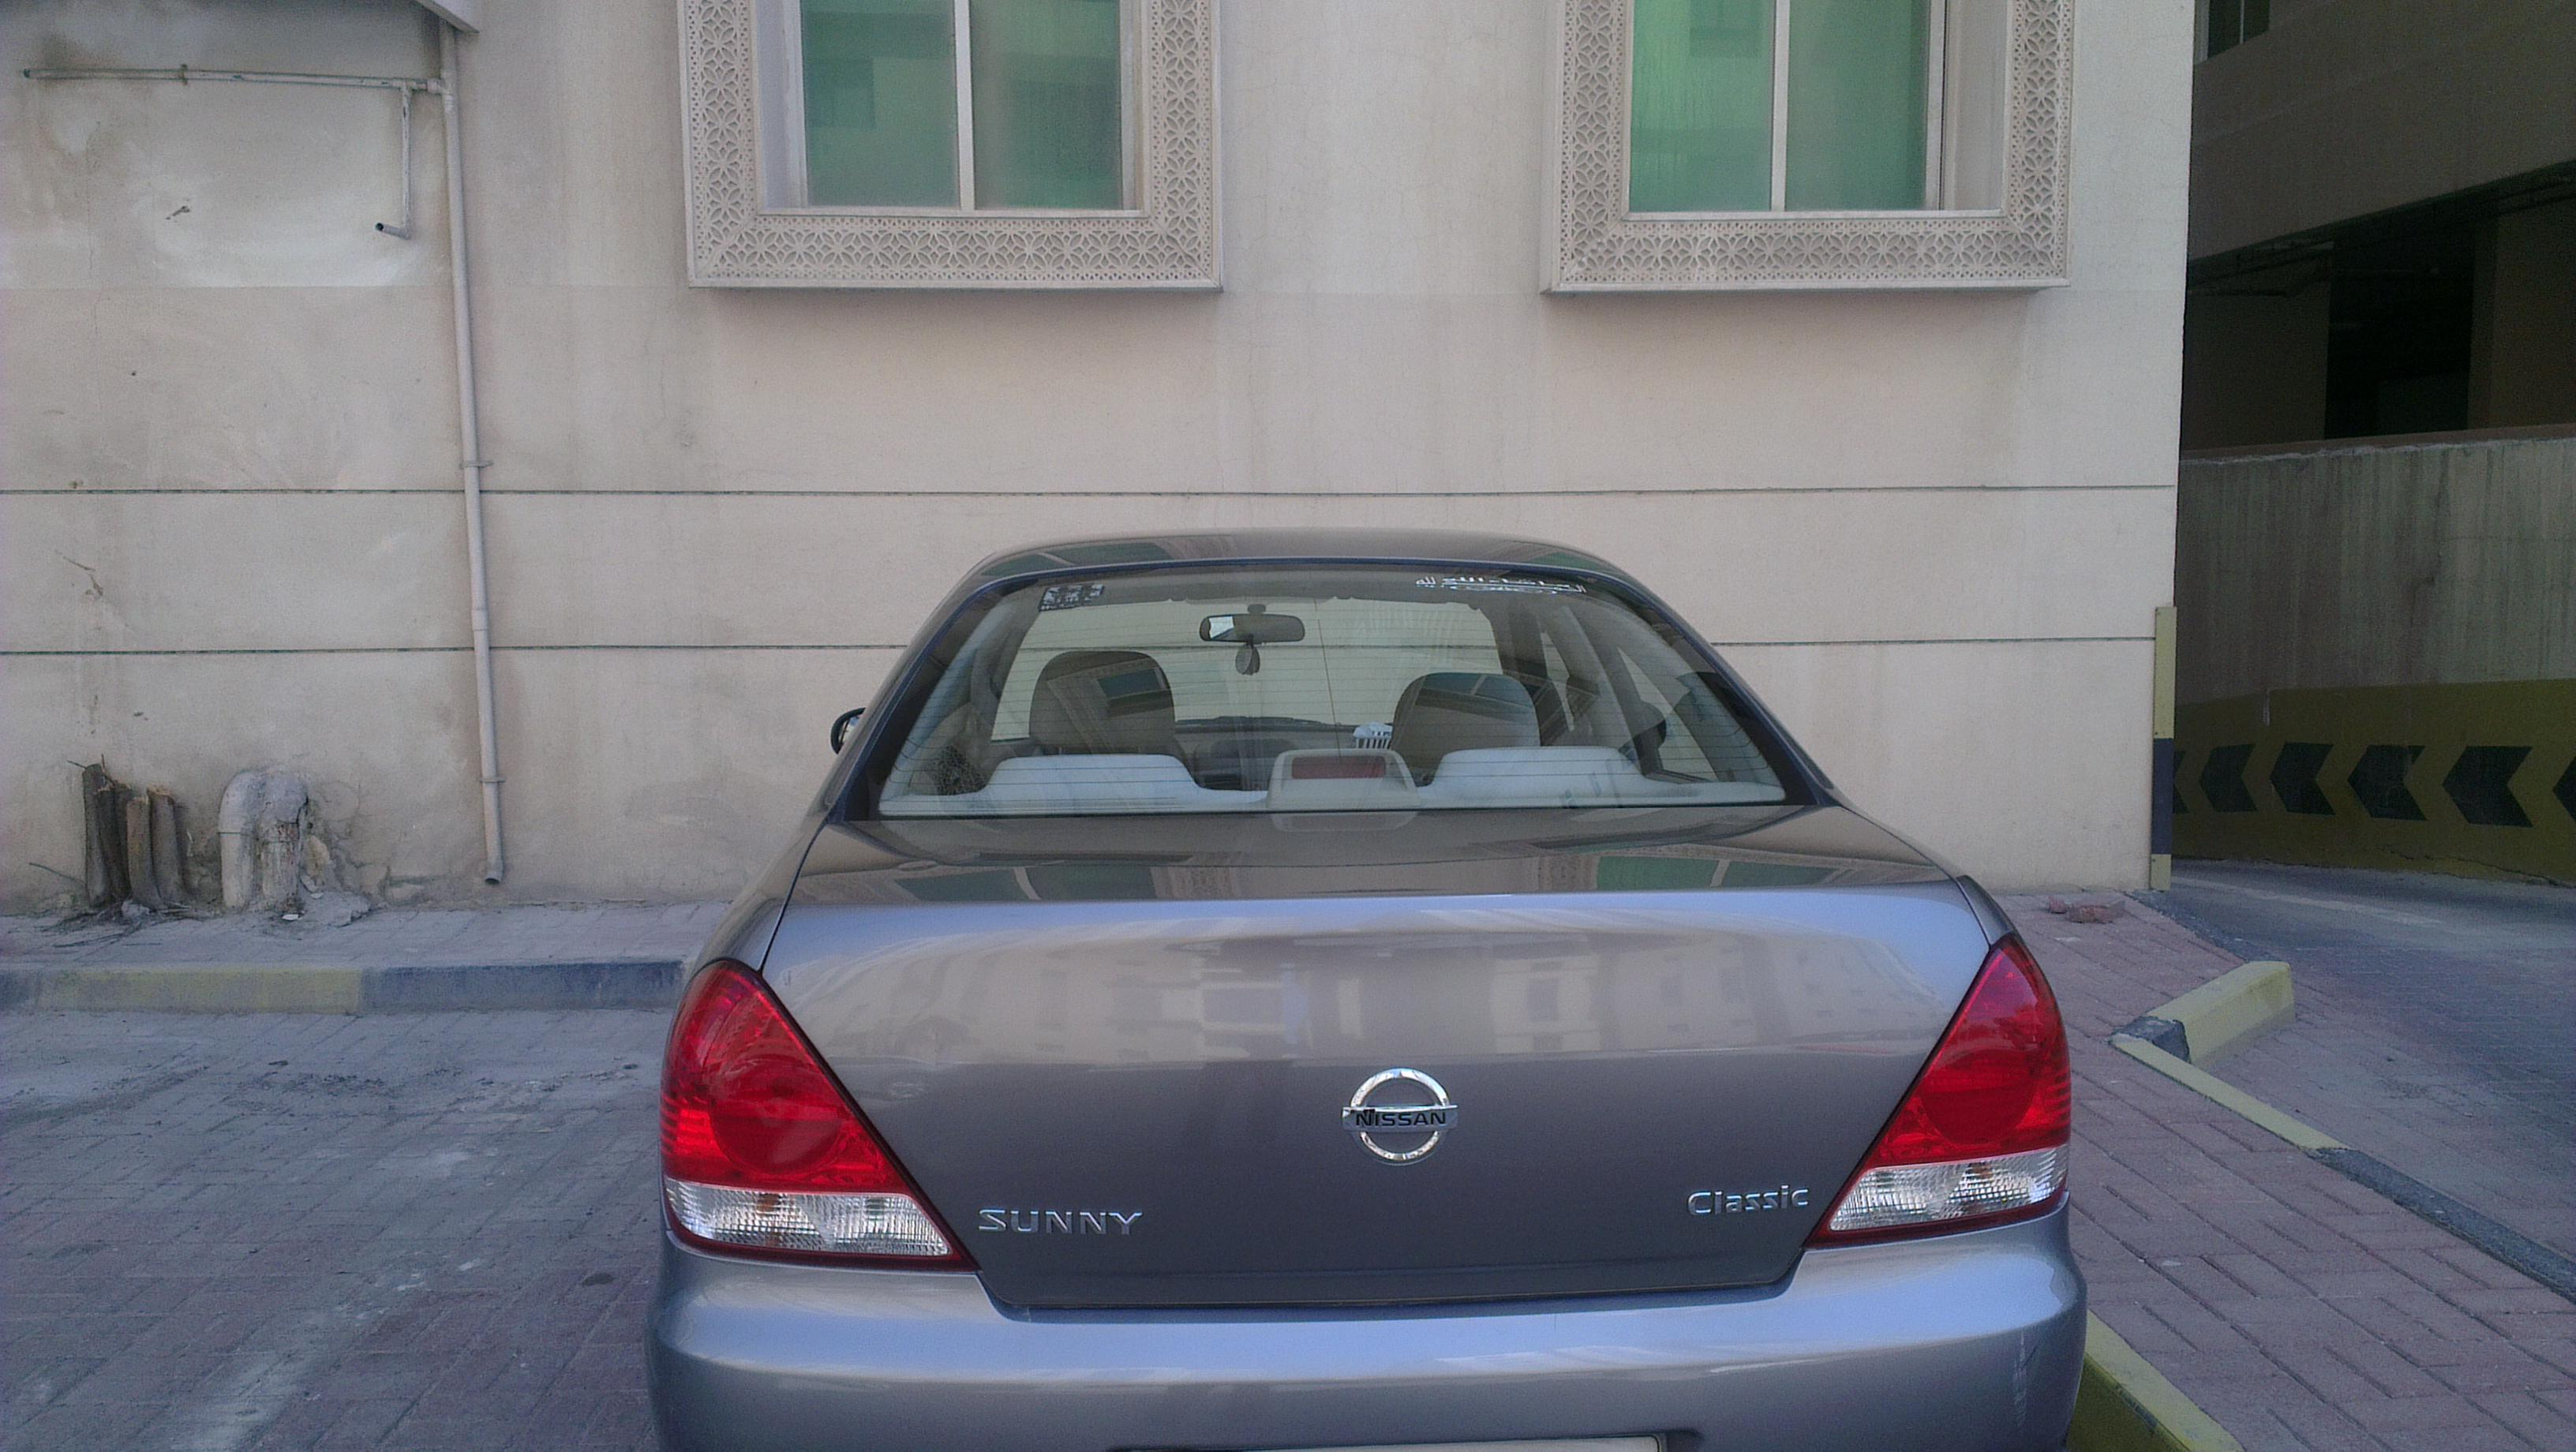 Car For Sale Nissan Sunny 2010 Japan Made Qatar Living